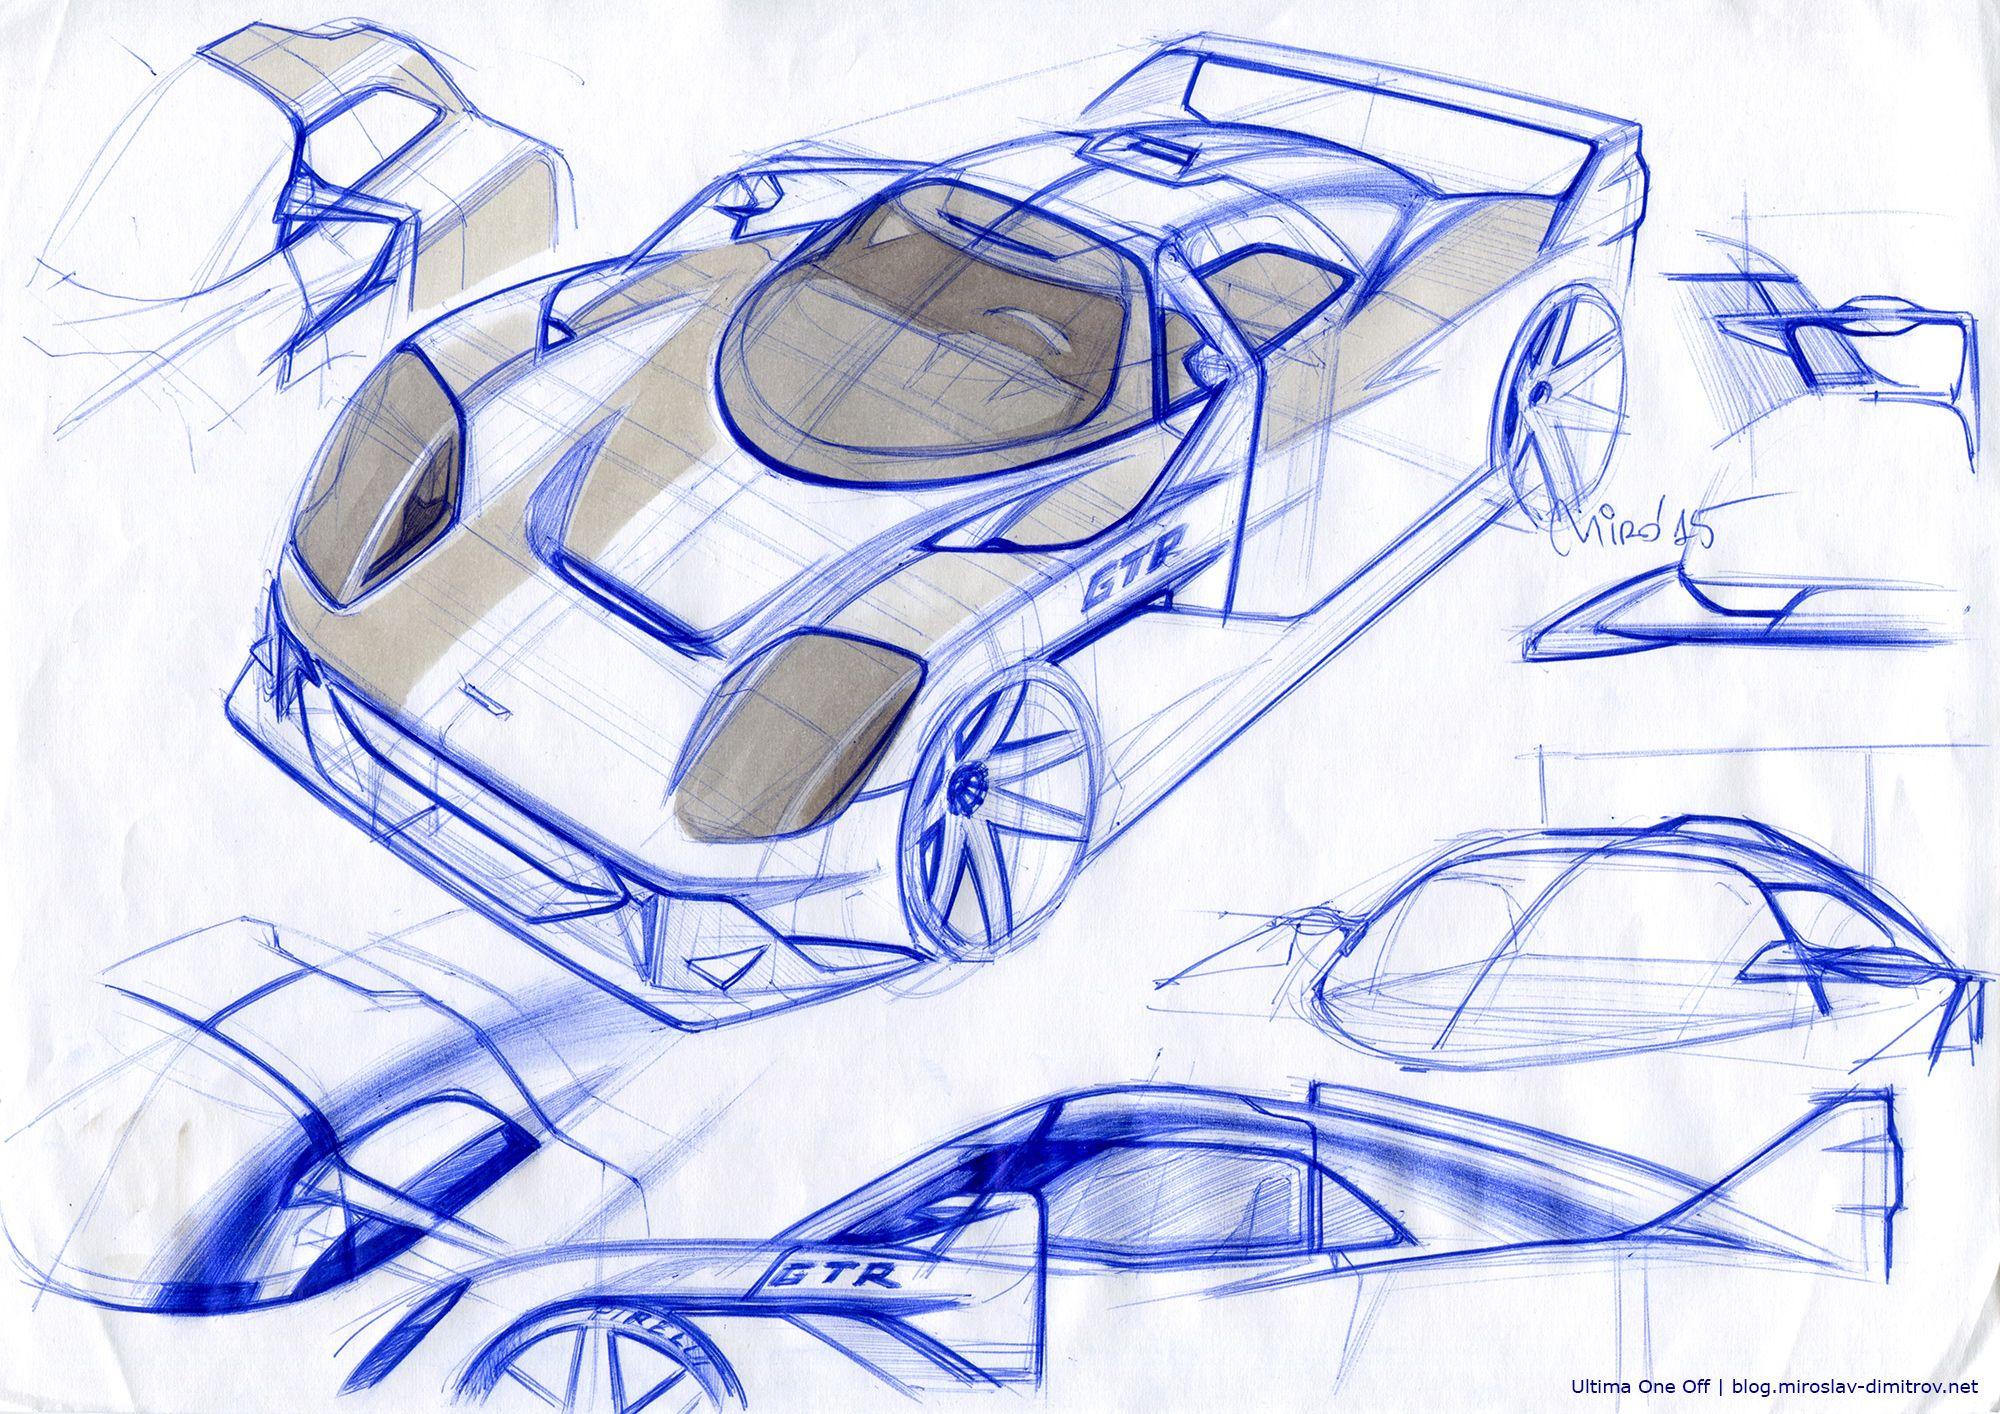 CAR DESIGN - AUTOMOTIVE CONCEPTS - VEHICLES | blog.miroslav-dimitrov ...